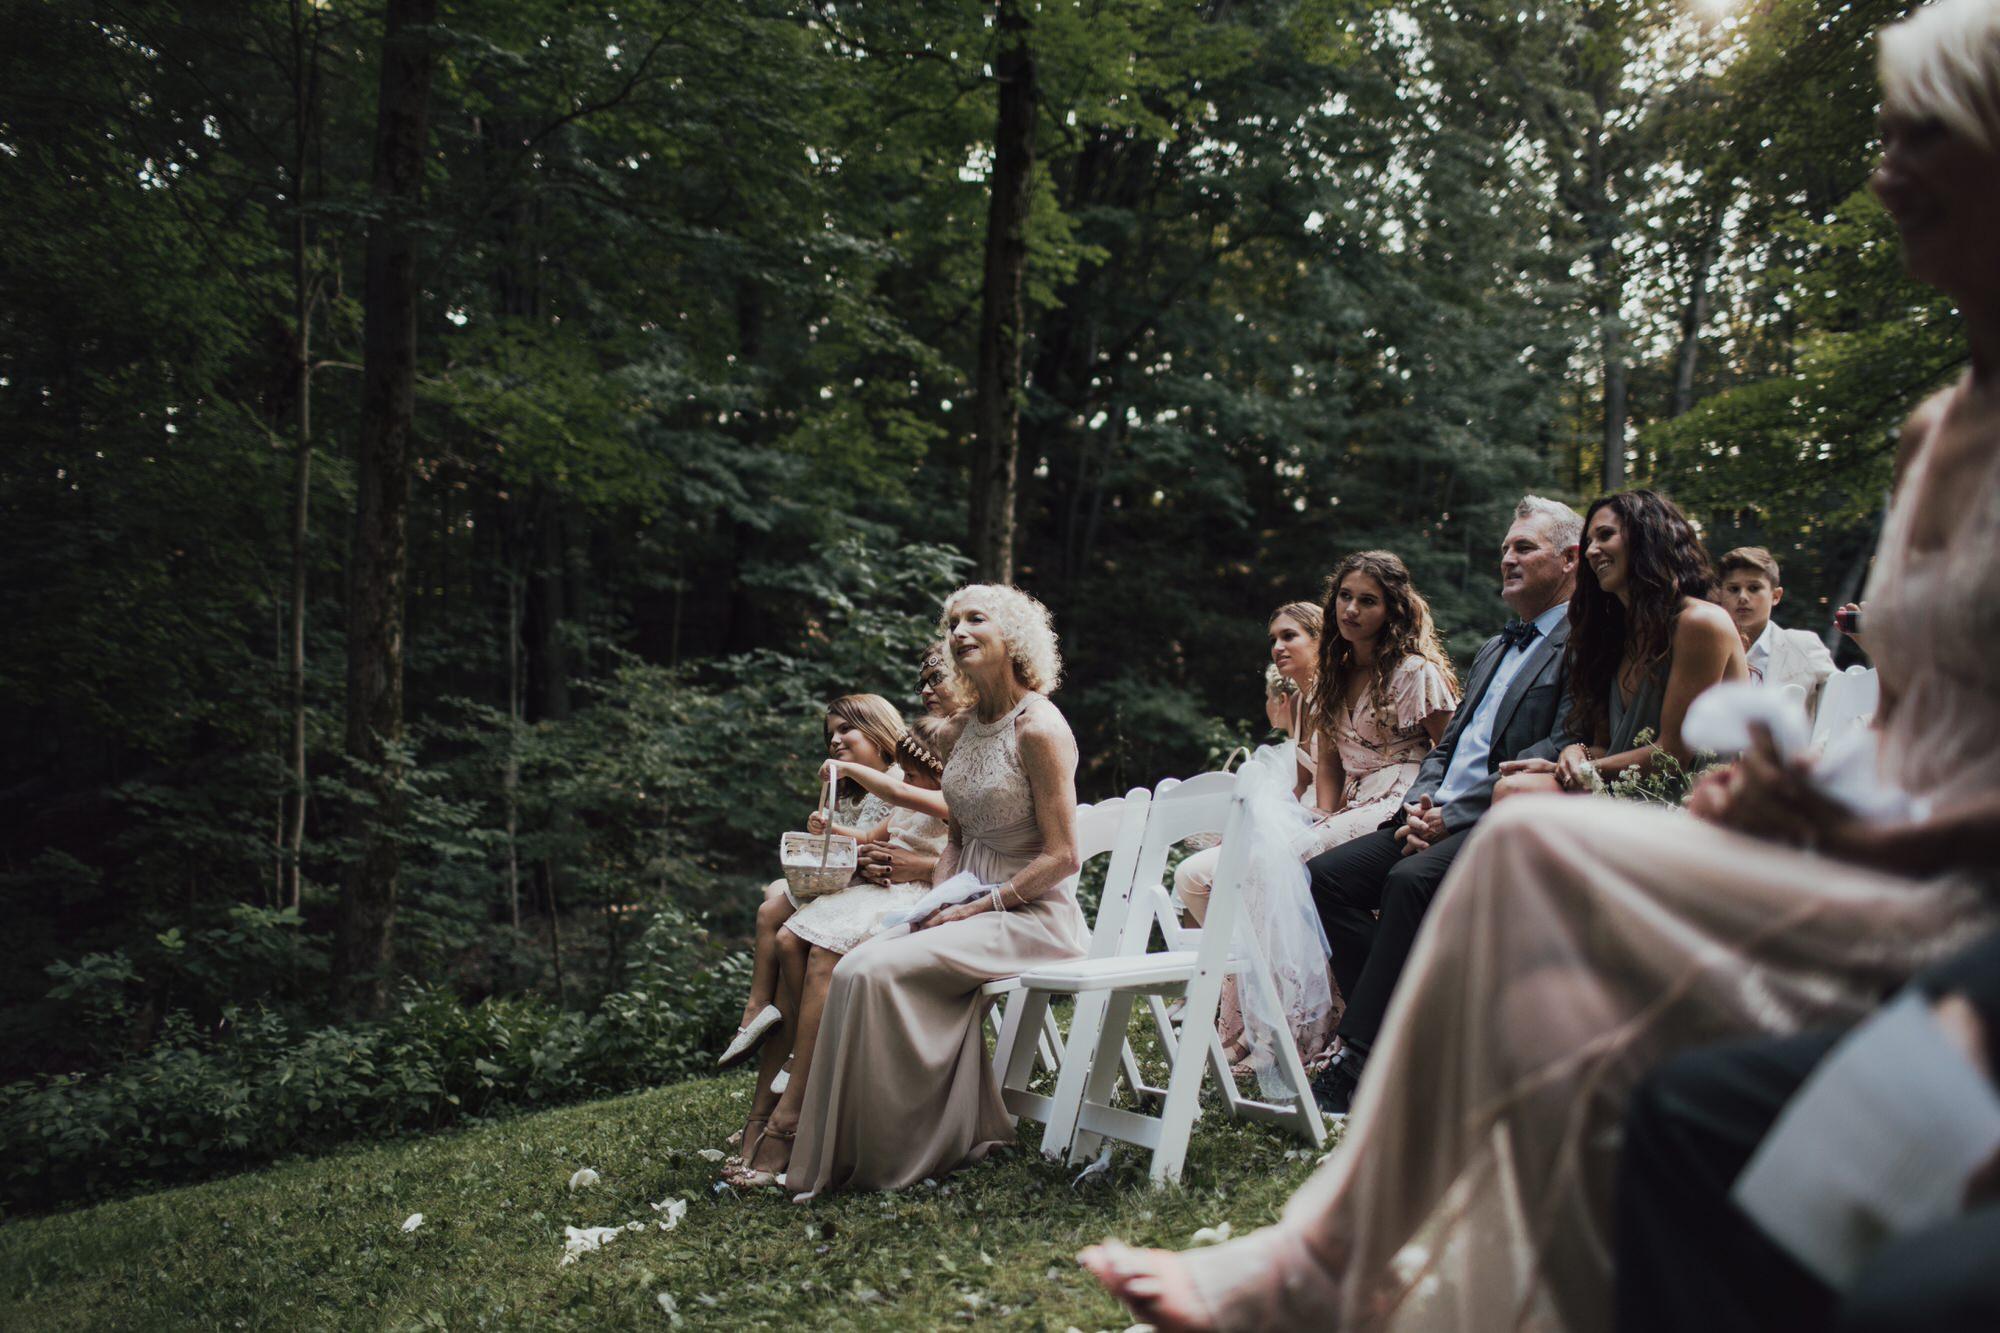 emily-aaron-rochester-new-york-wedding-photographer-71.JPG